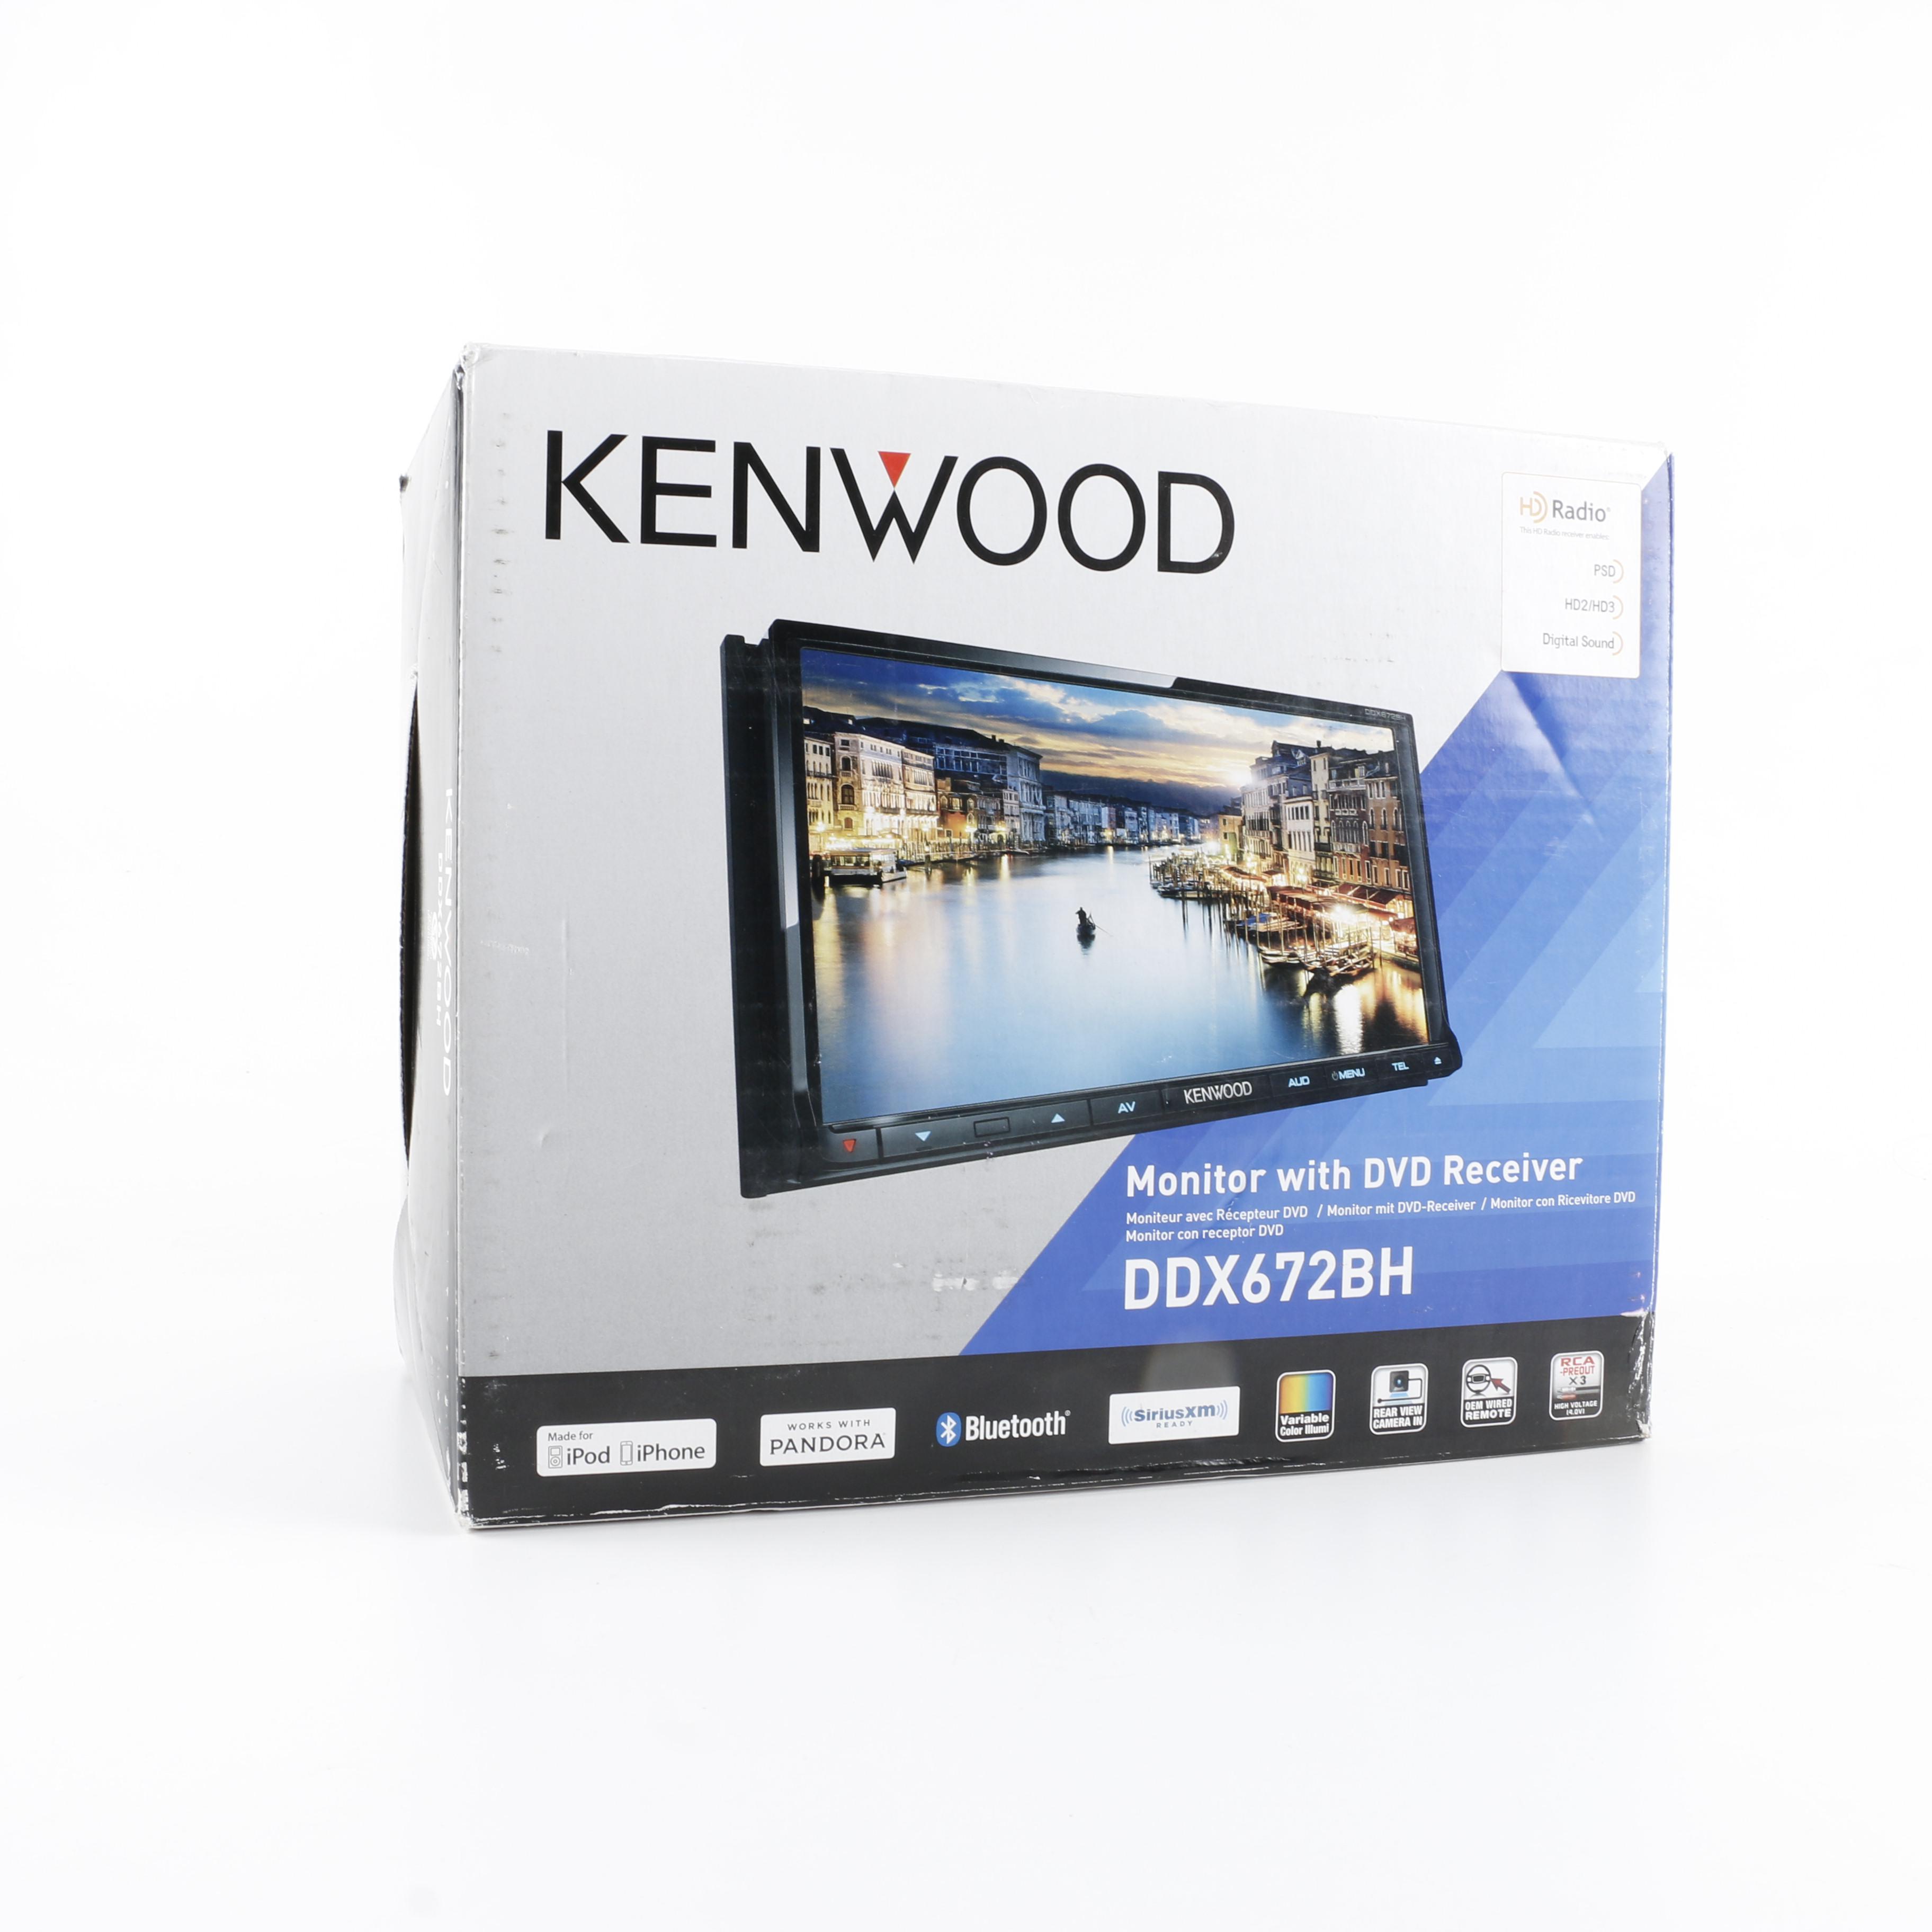 kenwood ddx672bh car stereo monitor  dvd receiver   ebth